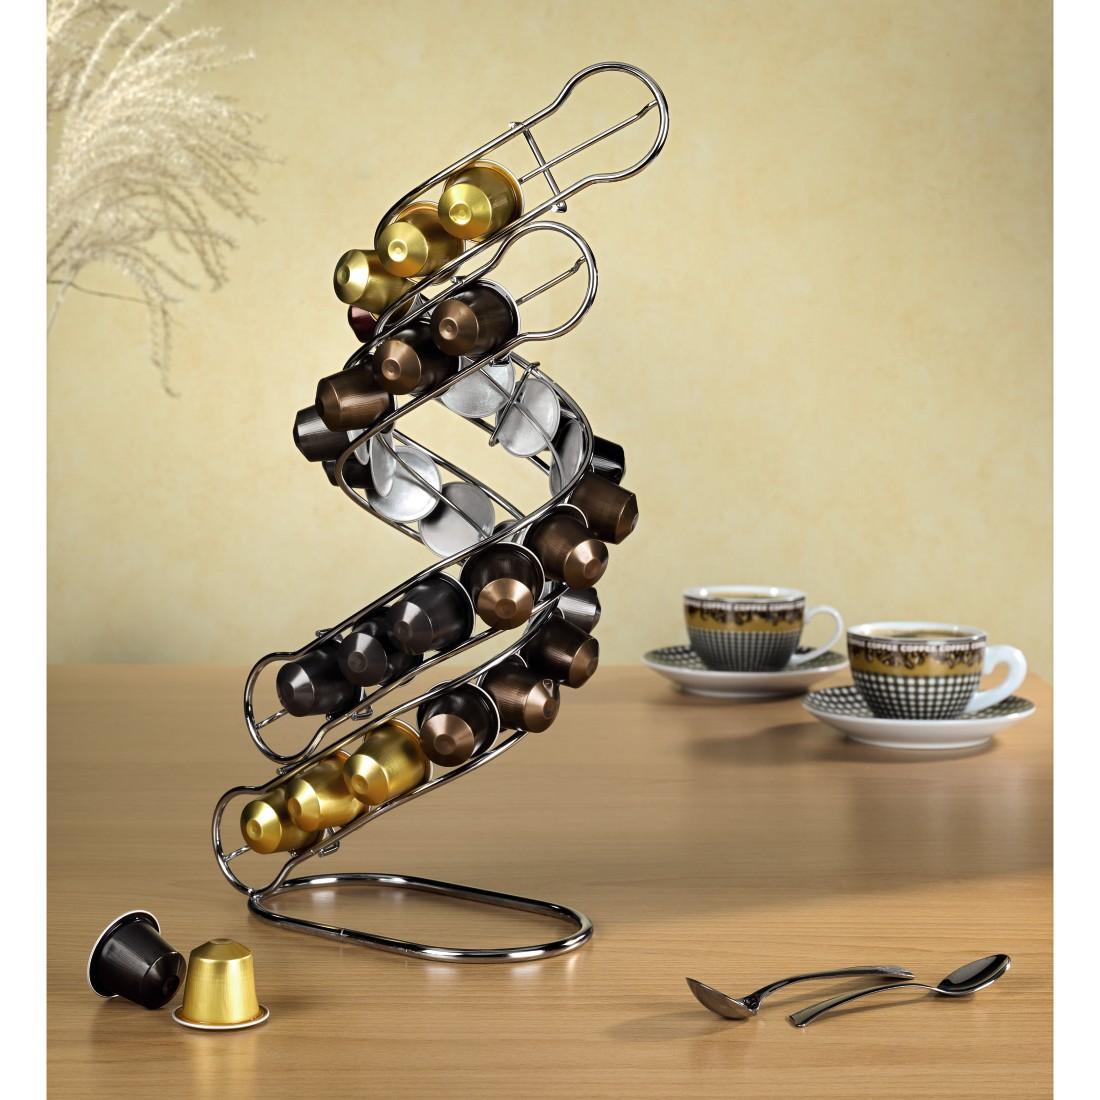 xavax kaffee kapselst nder tornado f r nespresso f r 30. Black Bedroom Furniture Sets. Home Design Ideas